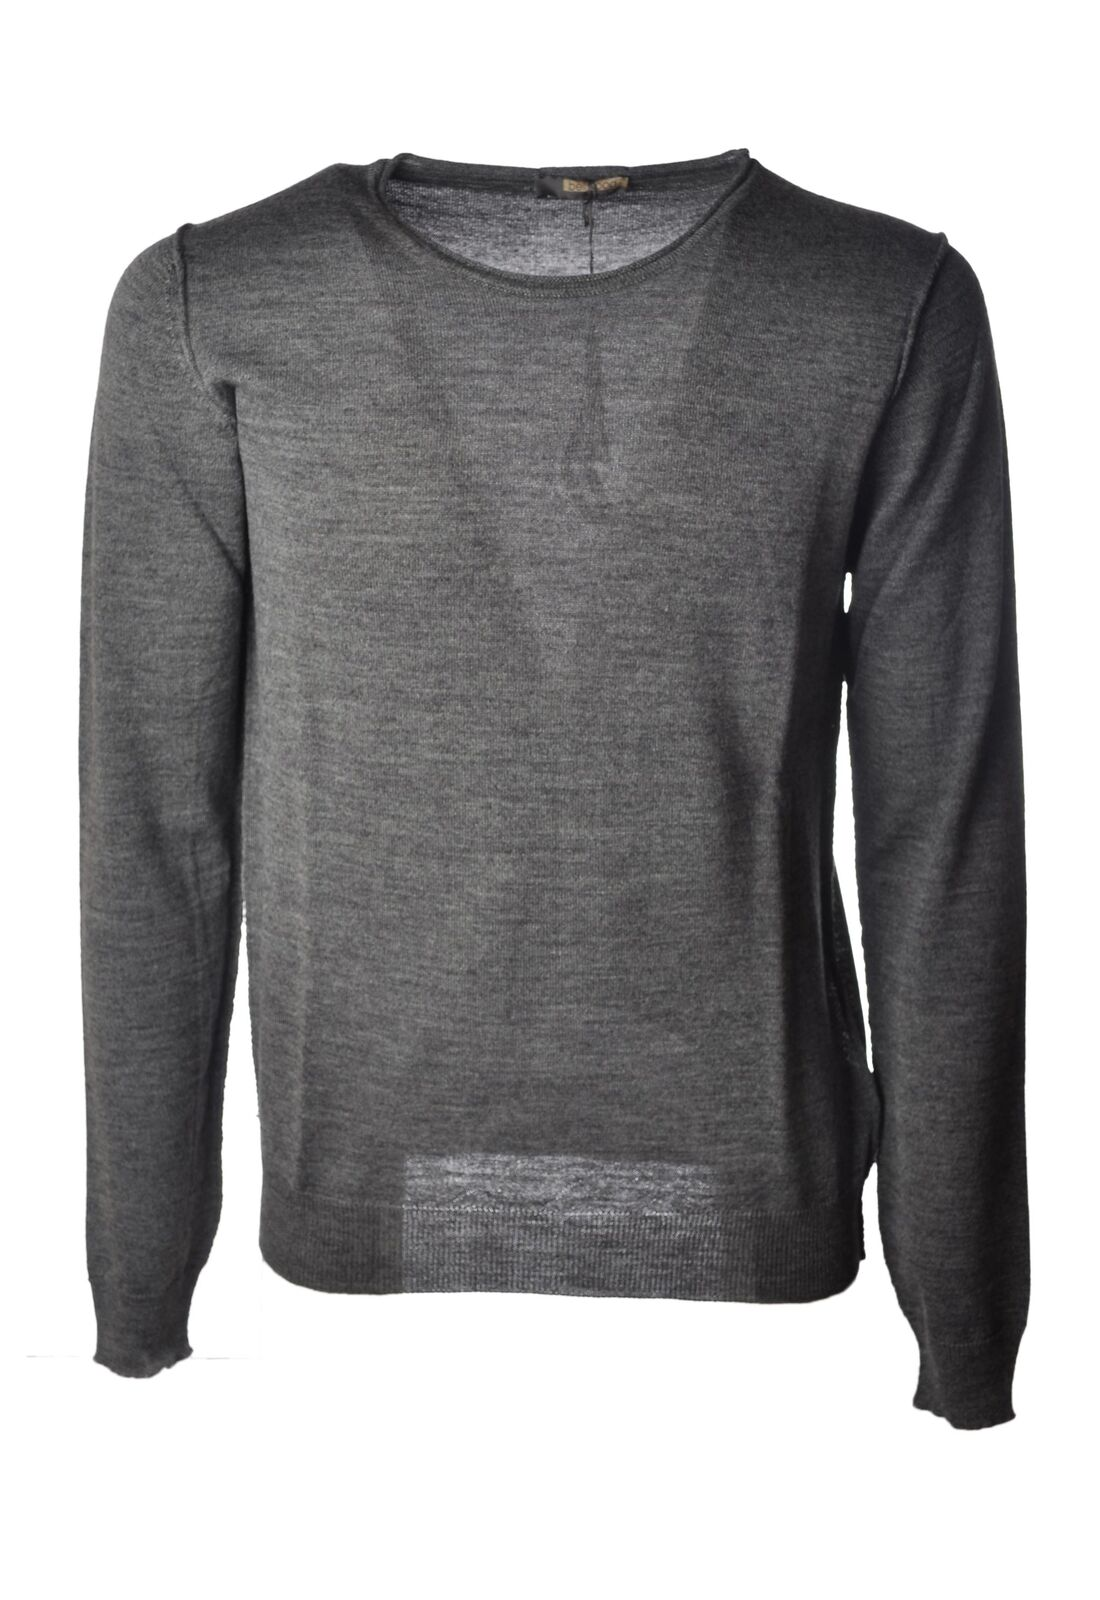 Bellwood  -  Sweaters - Male - Grey - 4162228A184125